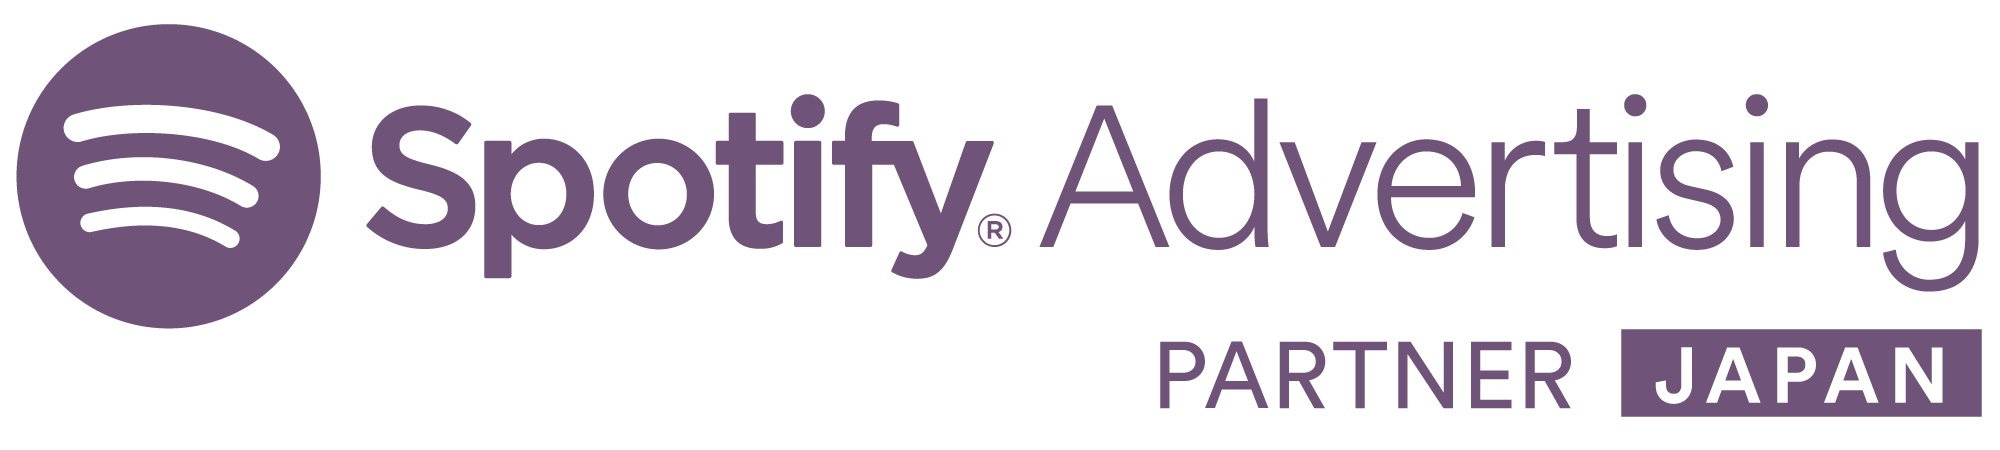 spotify advertising partner logo